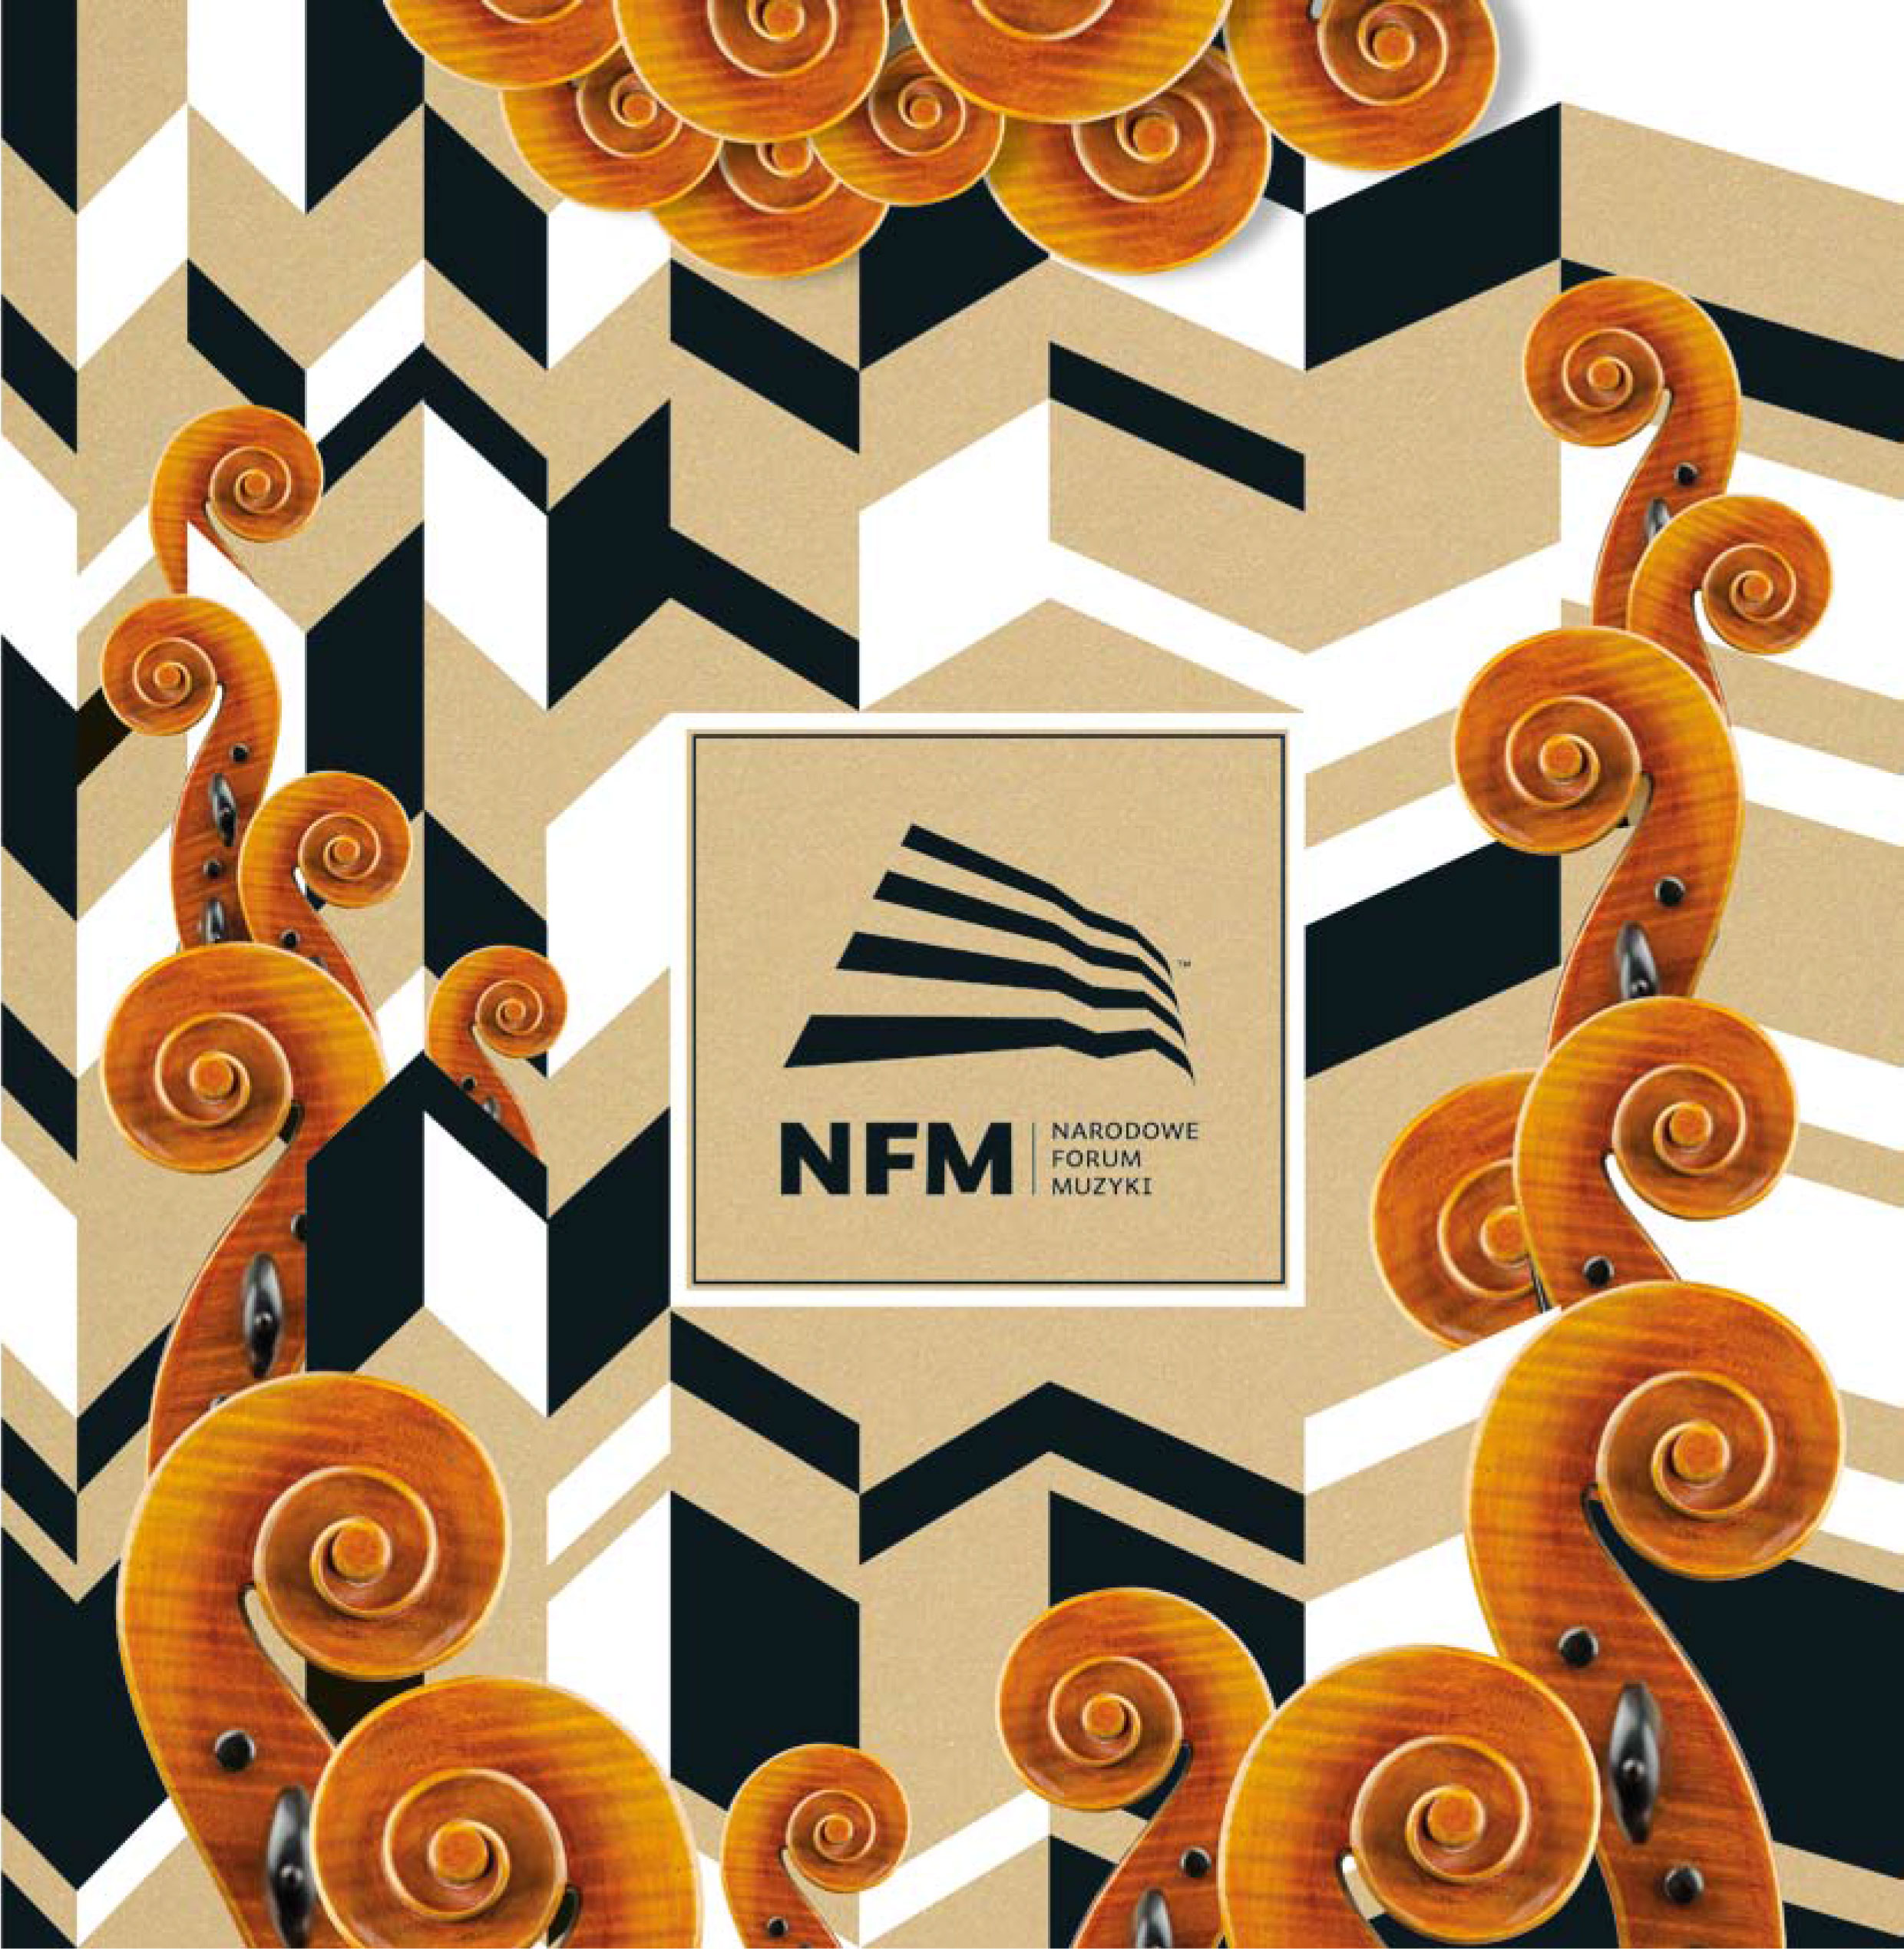 Katalog informacyjny NFM | EN